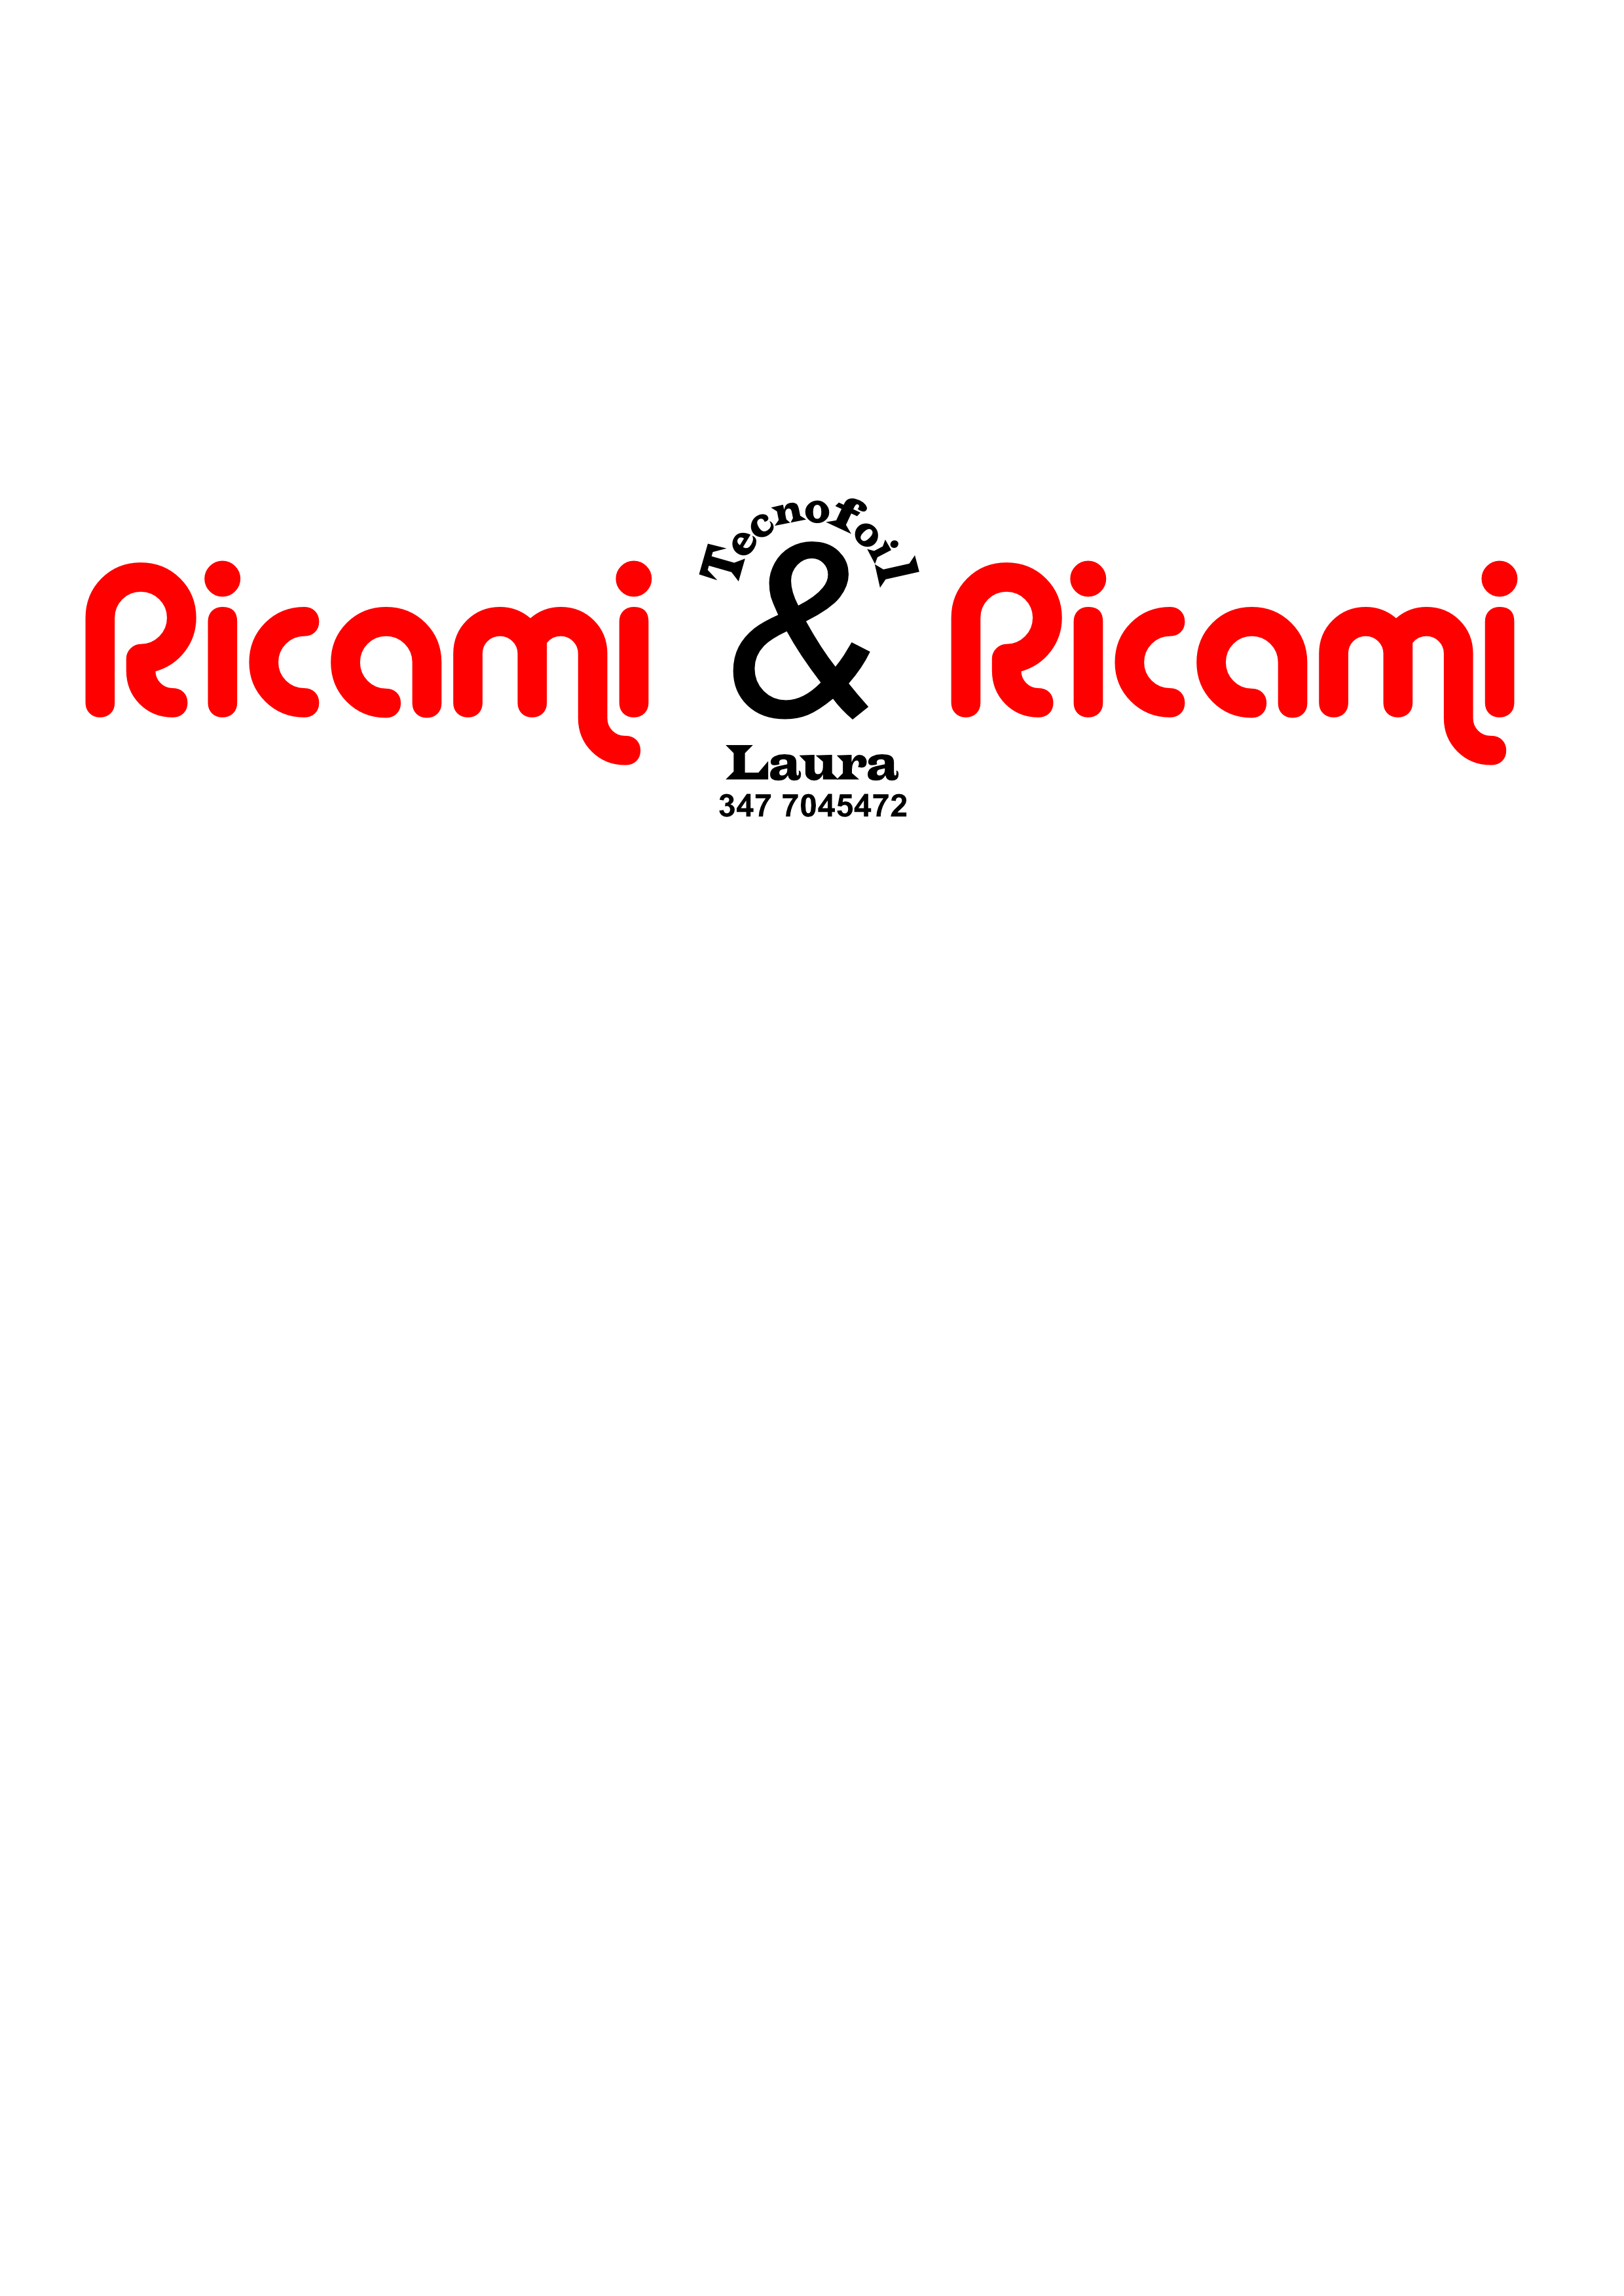 Ricami & Ricami di Tecnofoil  Srl